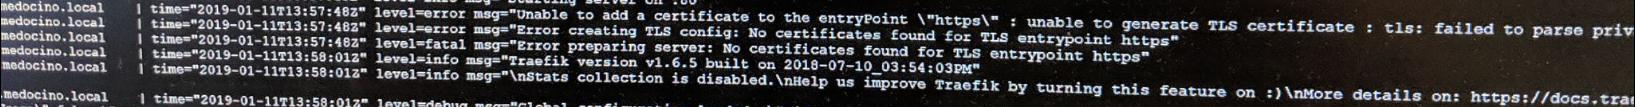 Encrypted Private Key